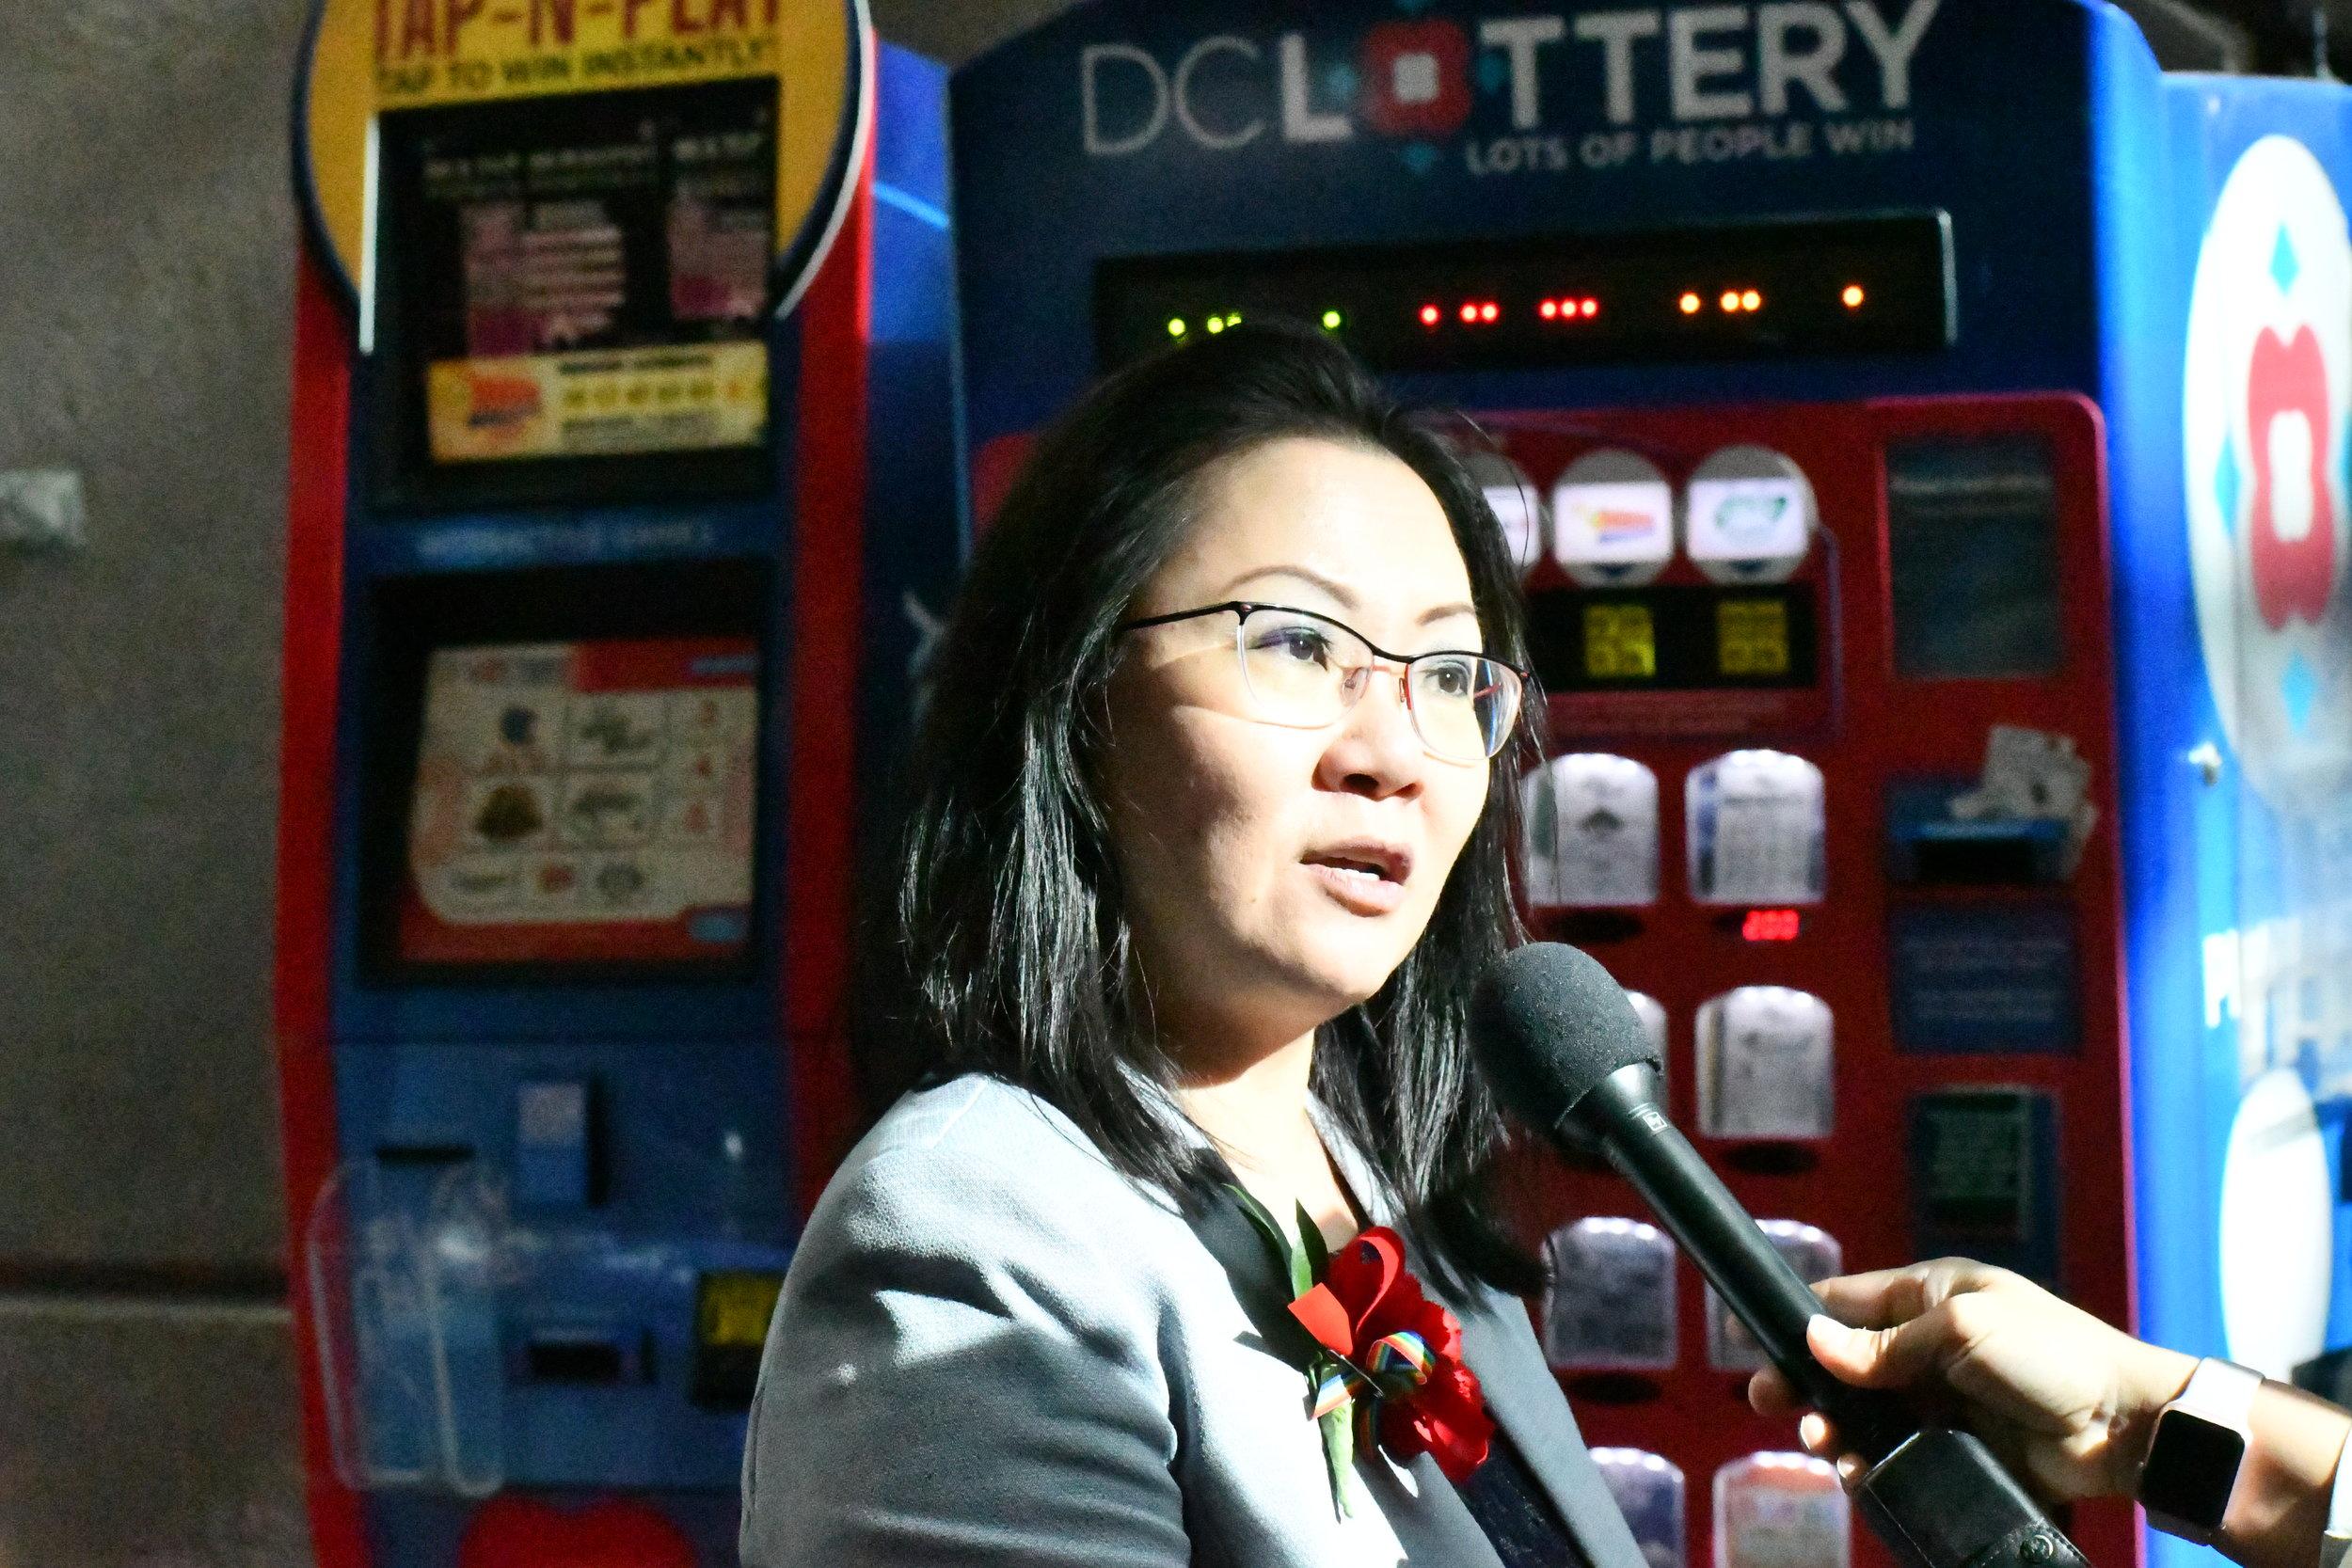 HyeSook Chung, Deputy Mayor Health and Human Services